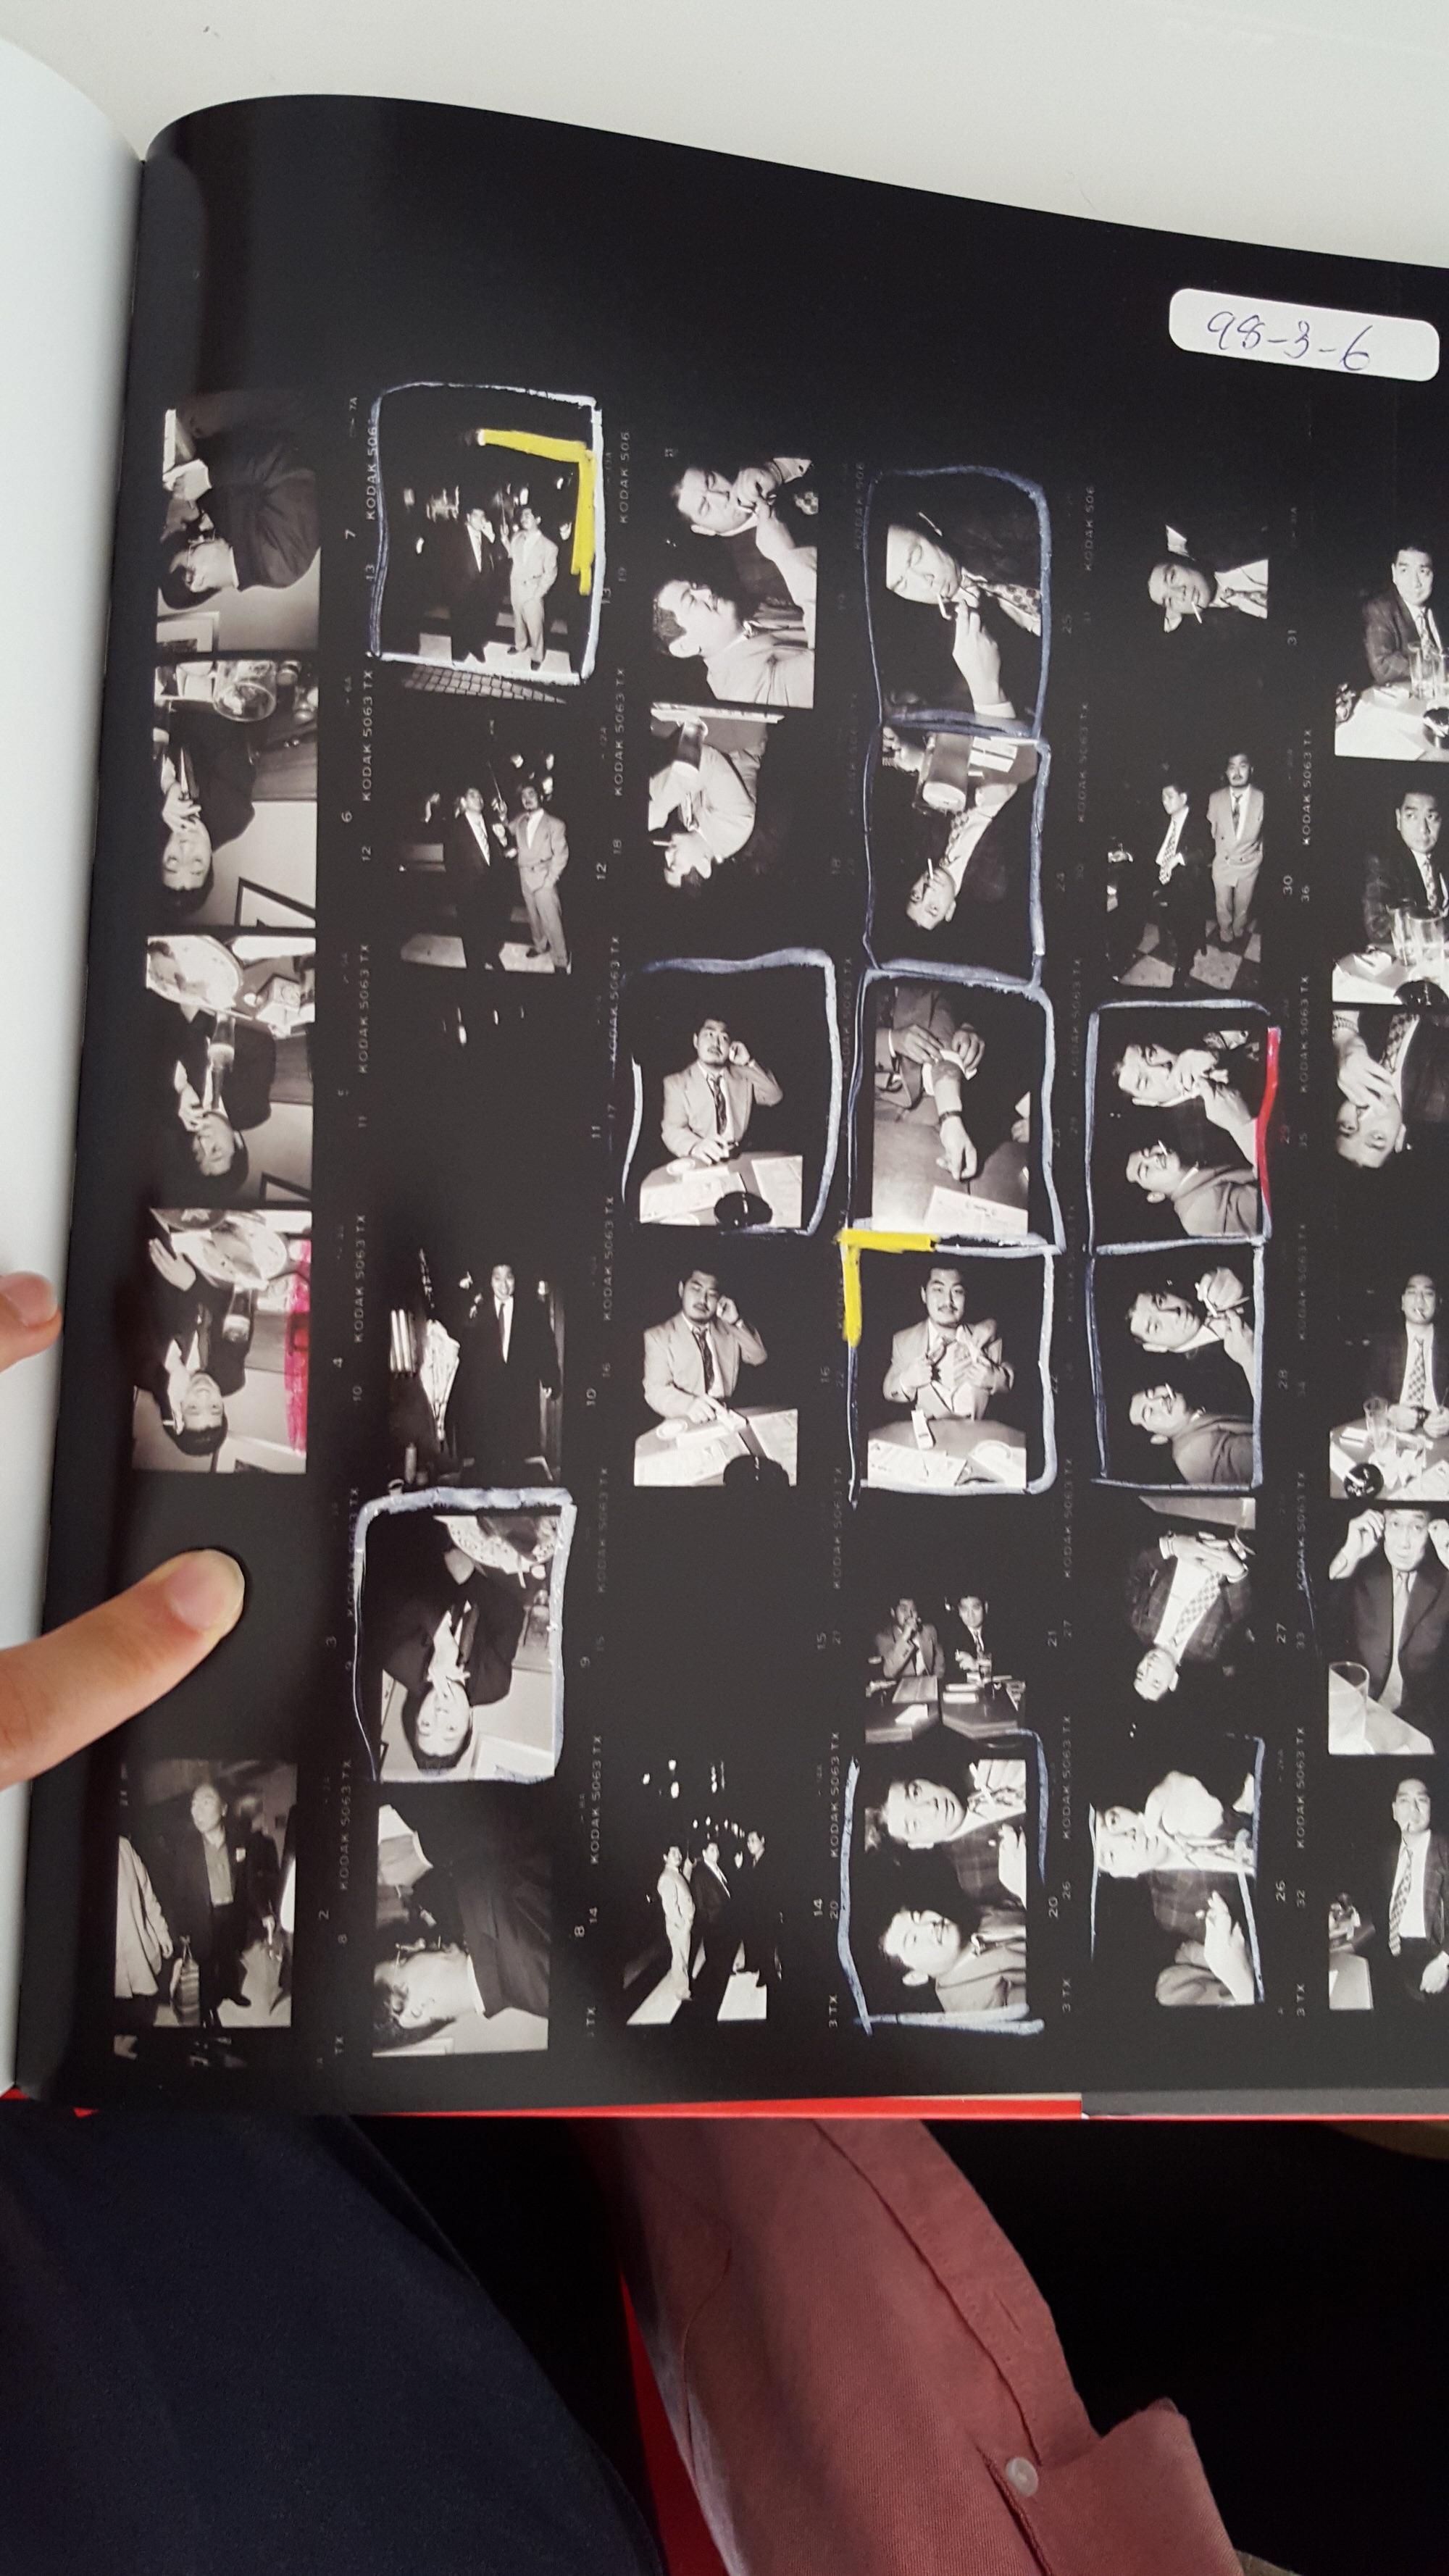 bruce gilden - yakuza cigarette contact sheet1